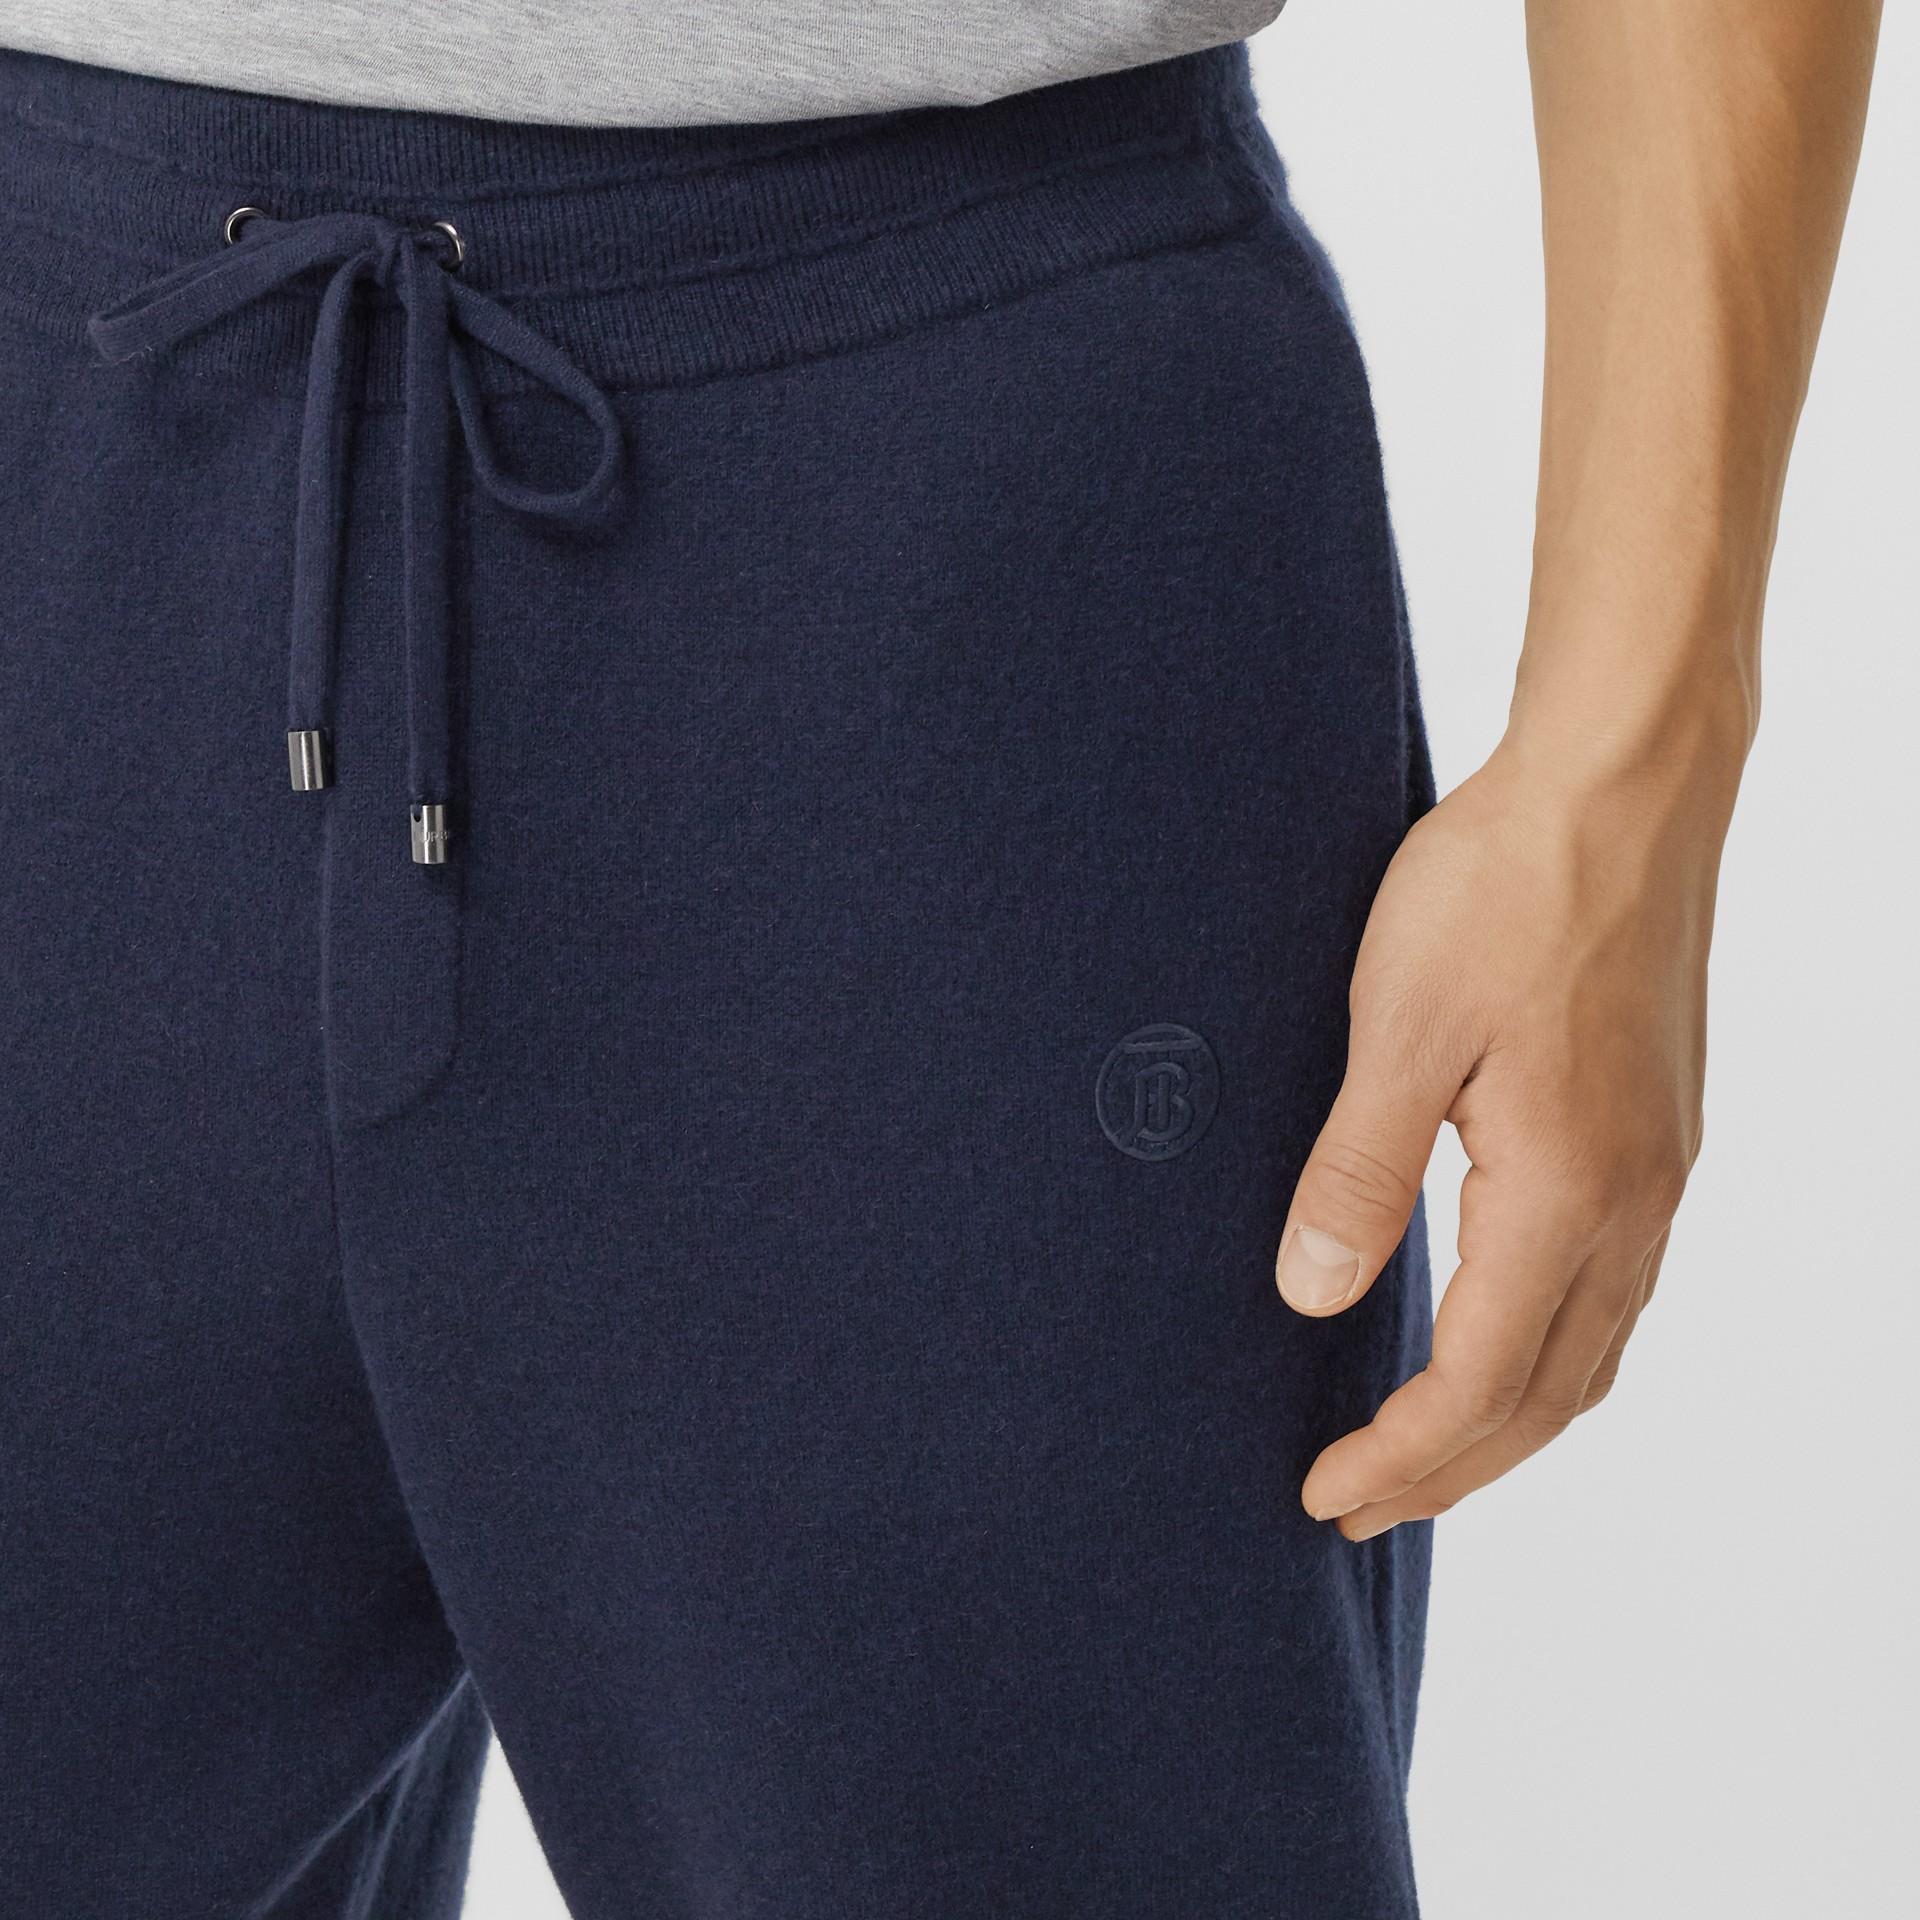 Monogram Motif Cashmere Blend Jogging Pants in Navy - Men   Burberry - gallery image 1